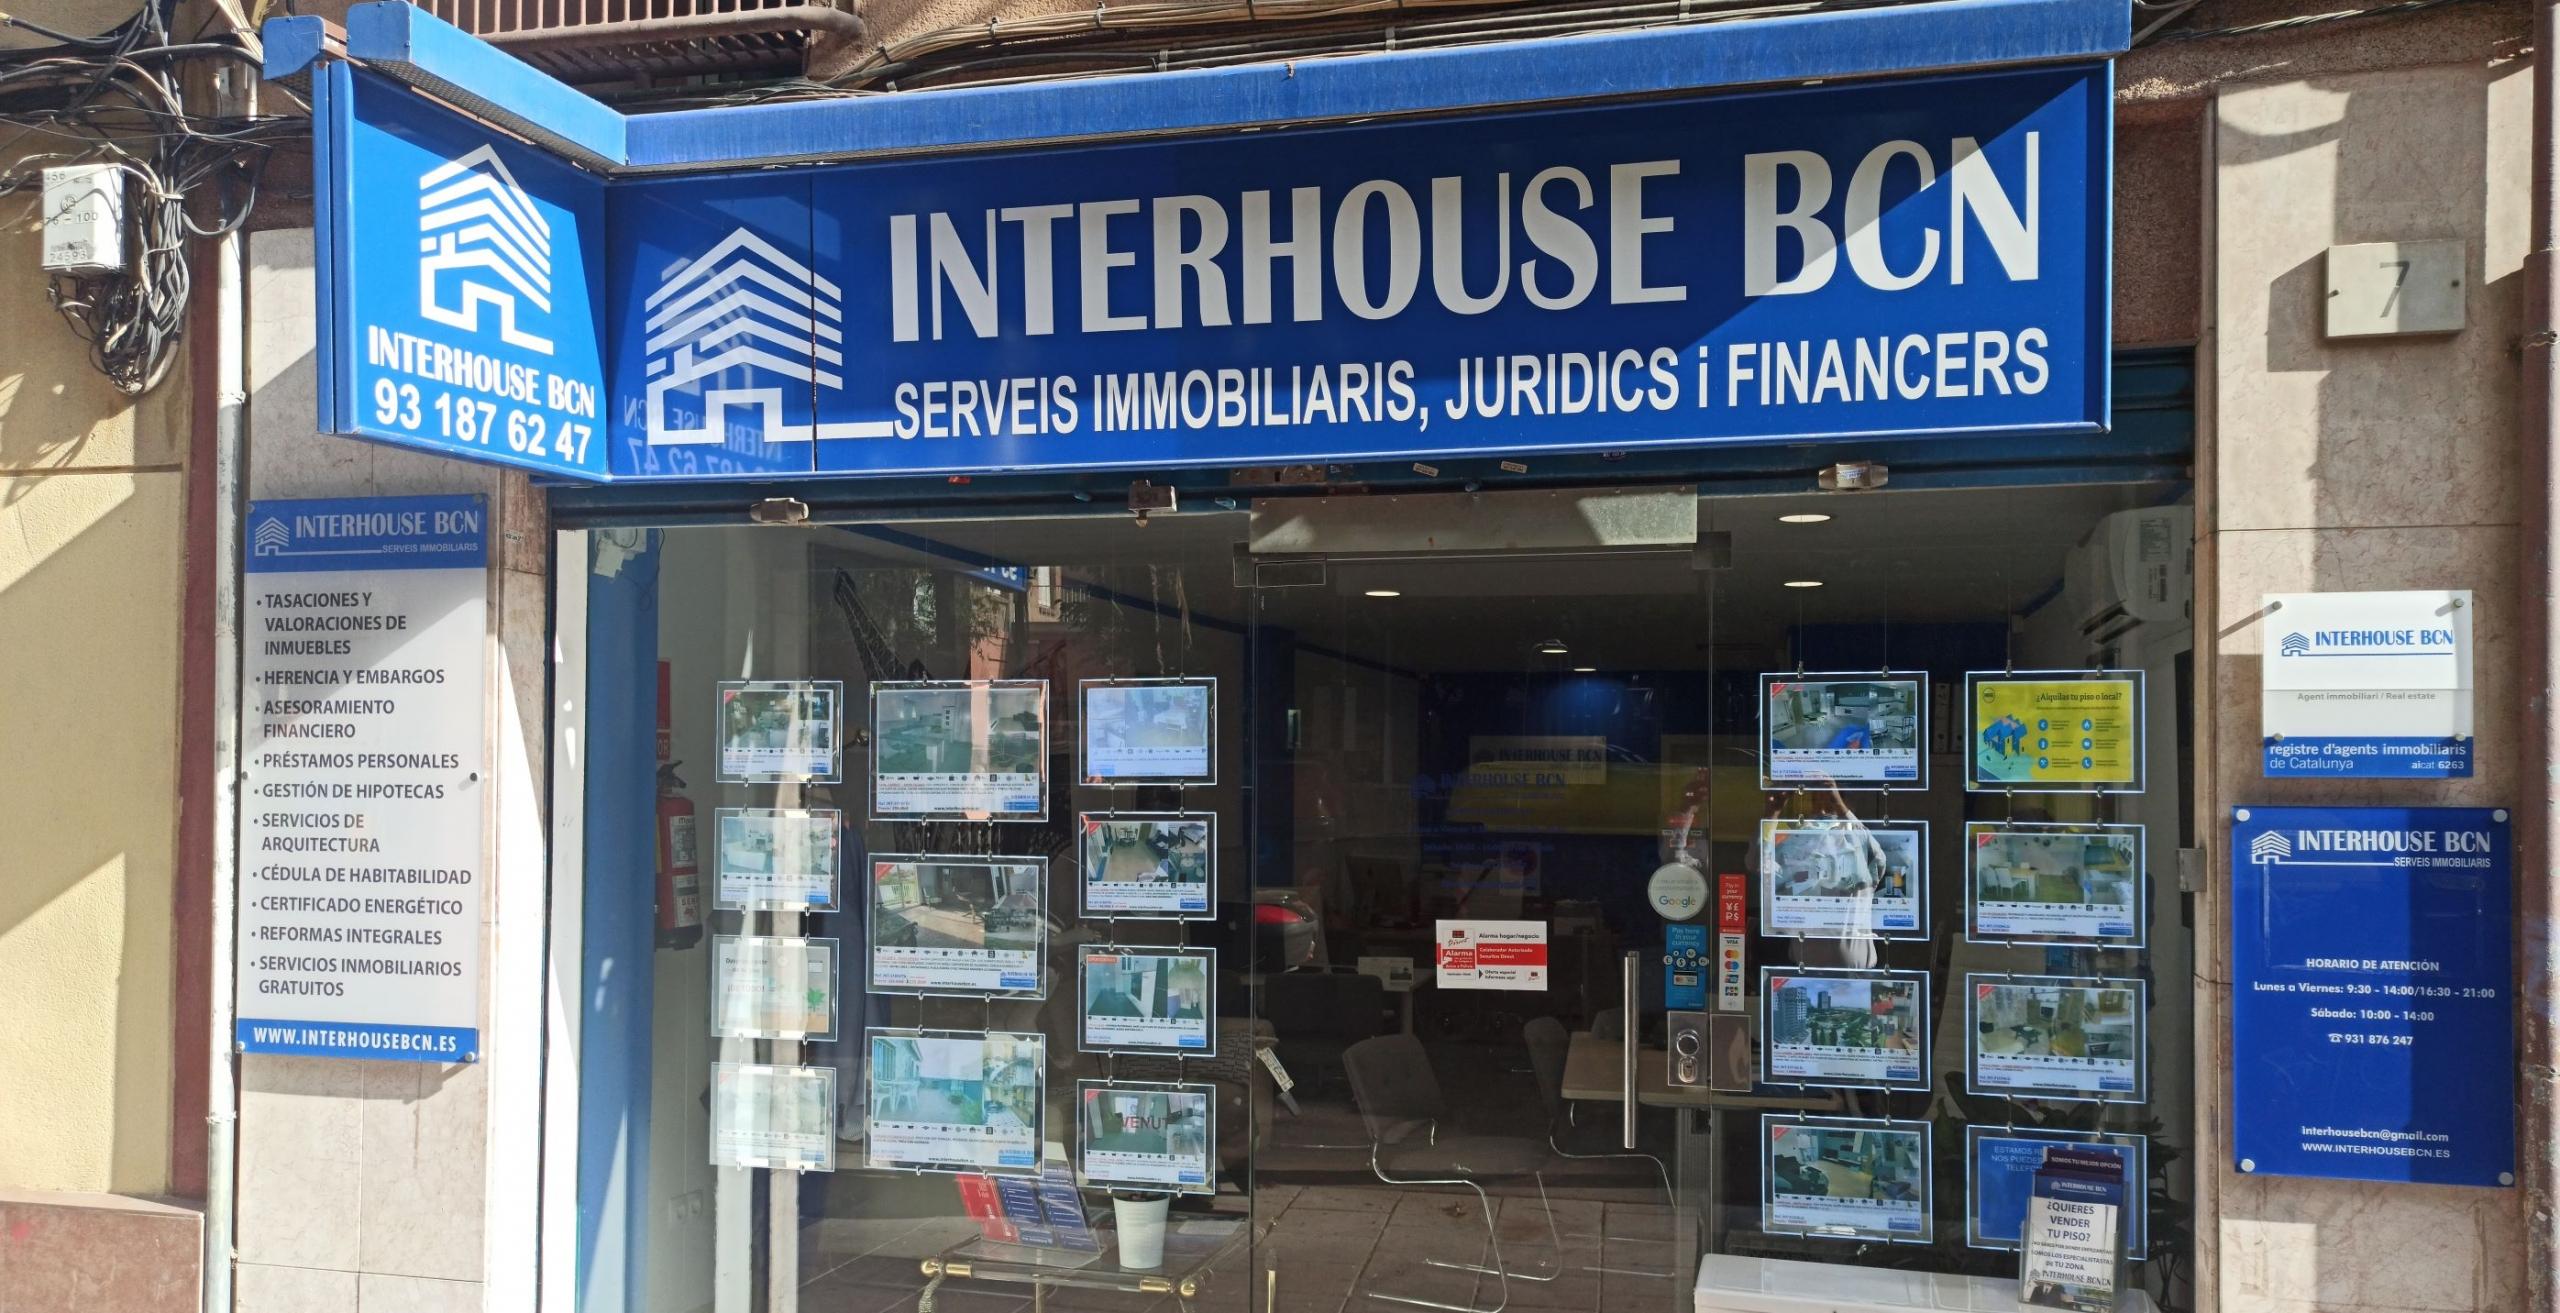 INTERHOUSE BCN, Inmobiliaria Hospitalet de Llobregat, Compra Venta, Alquiler de Pisos